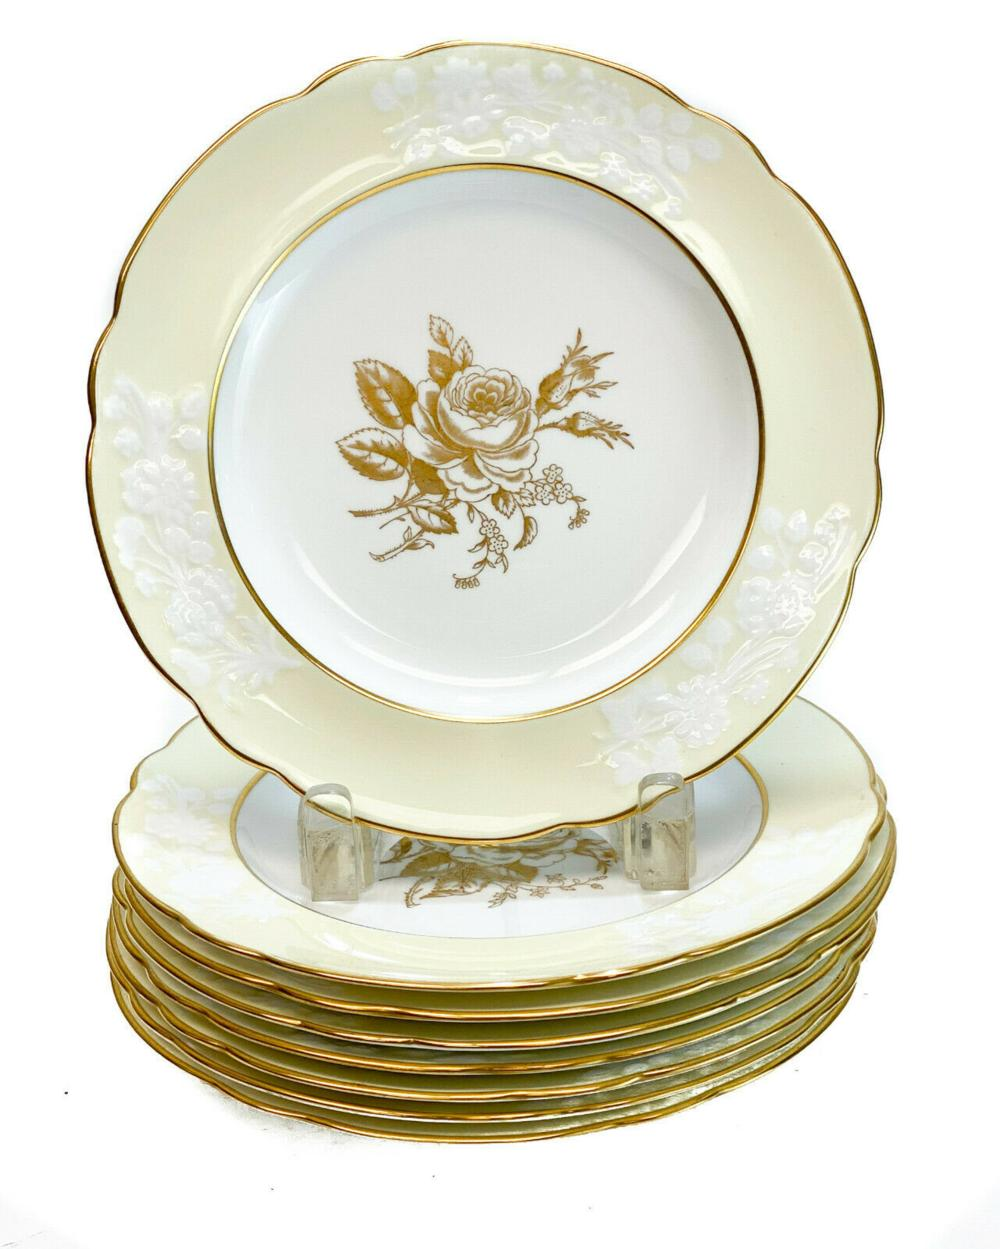 8 Copeland Spode Porcelain Salad Plates, c1900